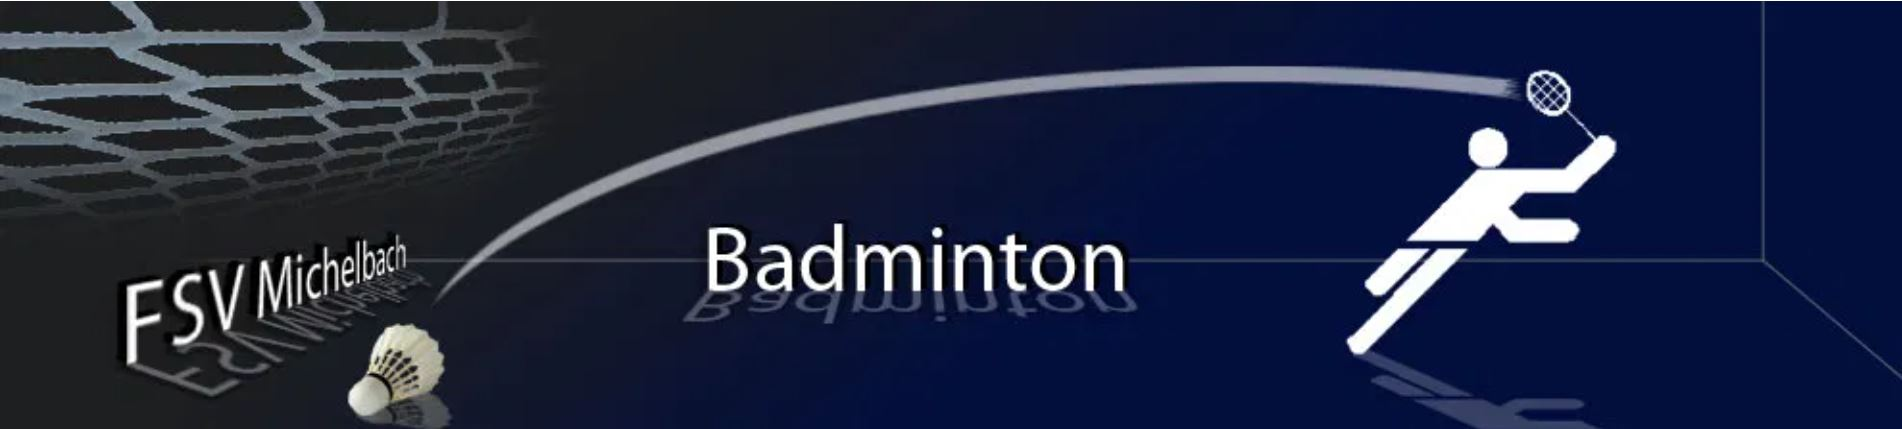 FSV Michelbach – Badminton